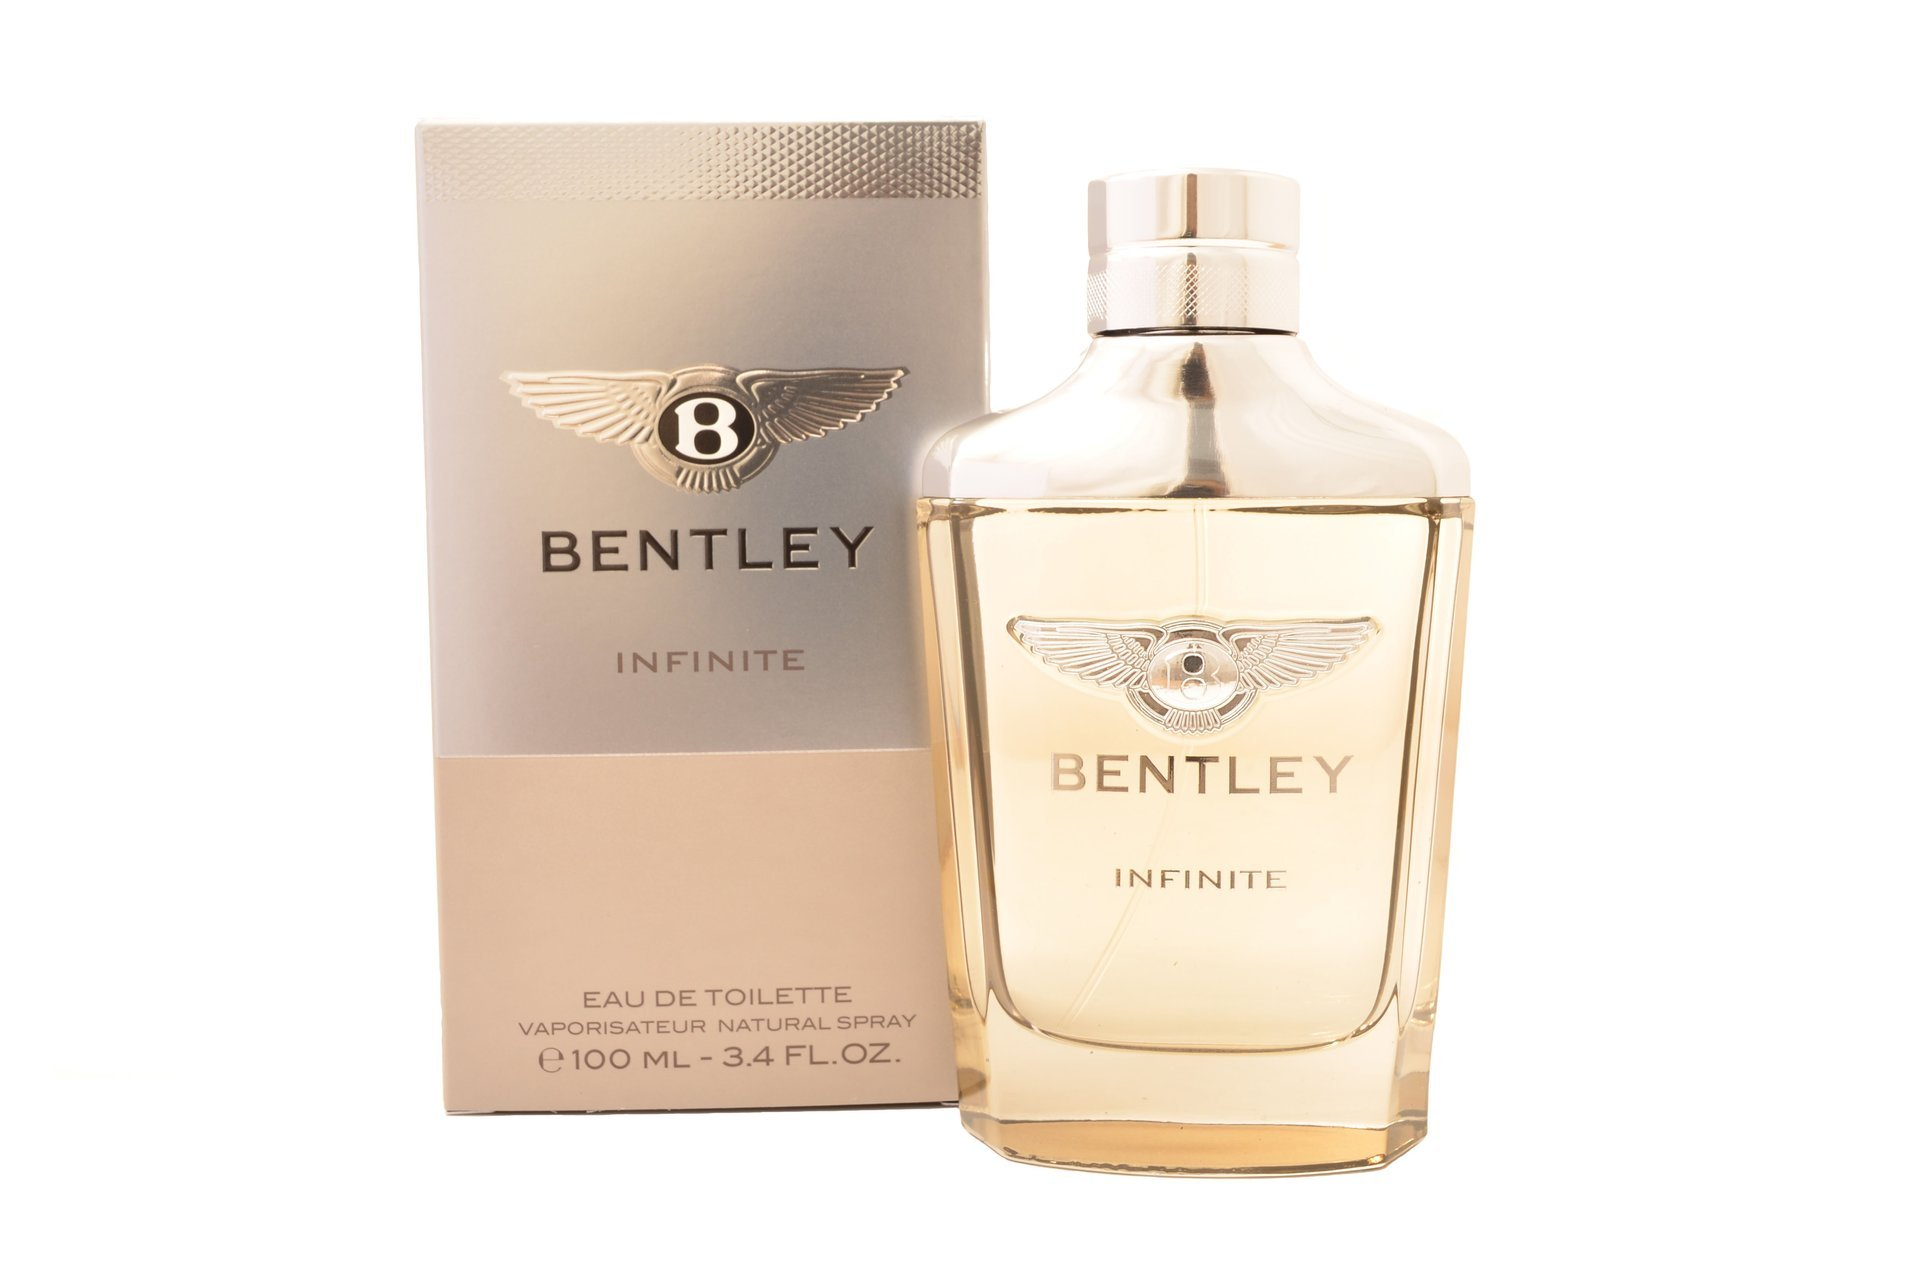 Bentley Infinite 100ml Eau De Toilette